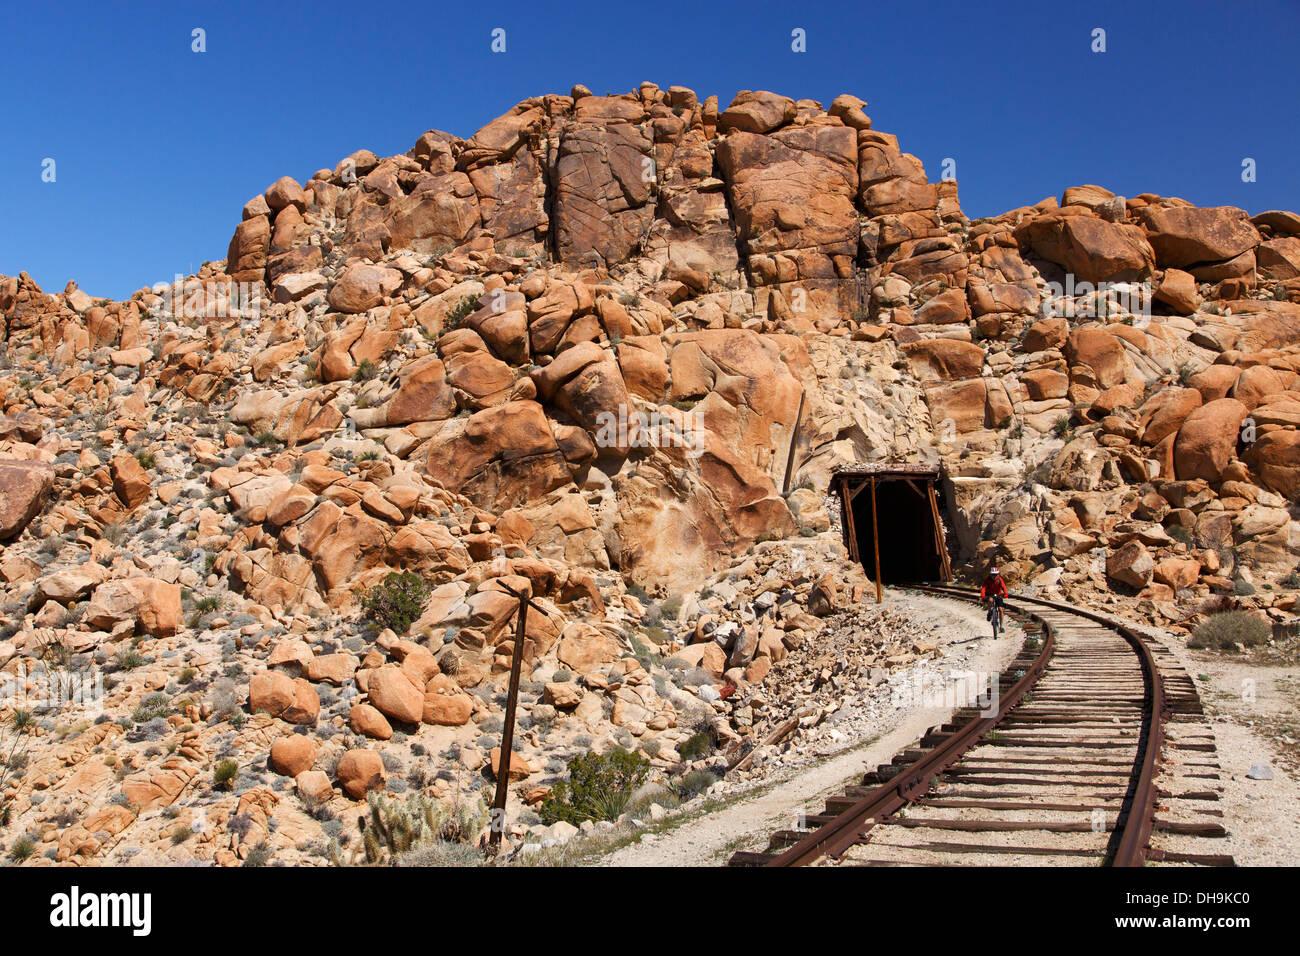 Mountain biking the Carrizo Gorge Railroad Track, Anza-Borrego Desert State Park, California. - Stock Image